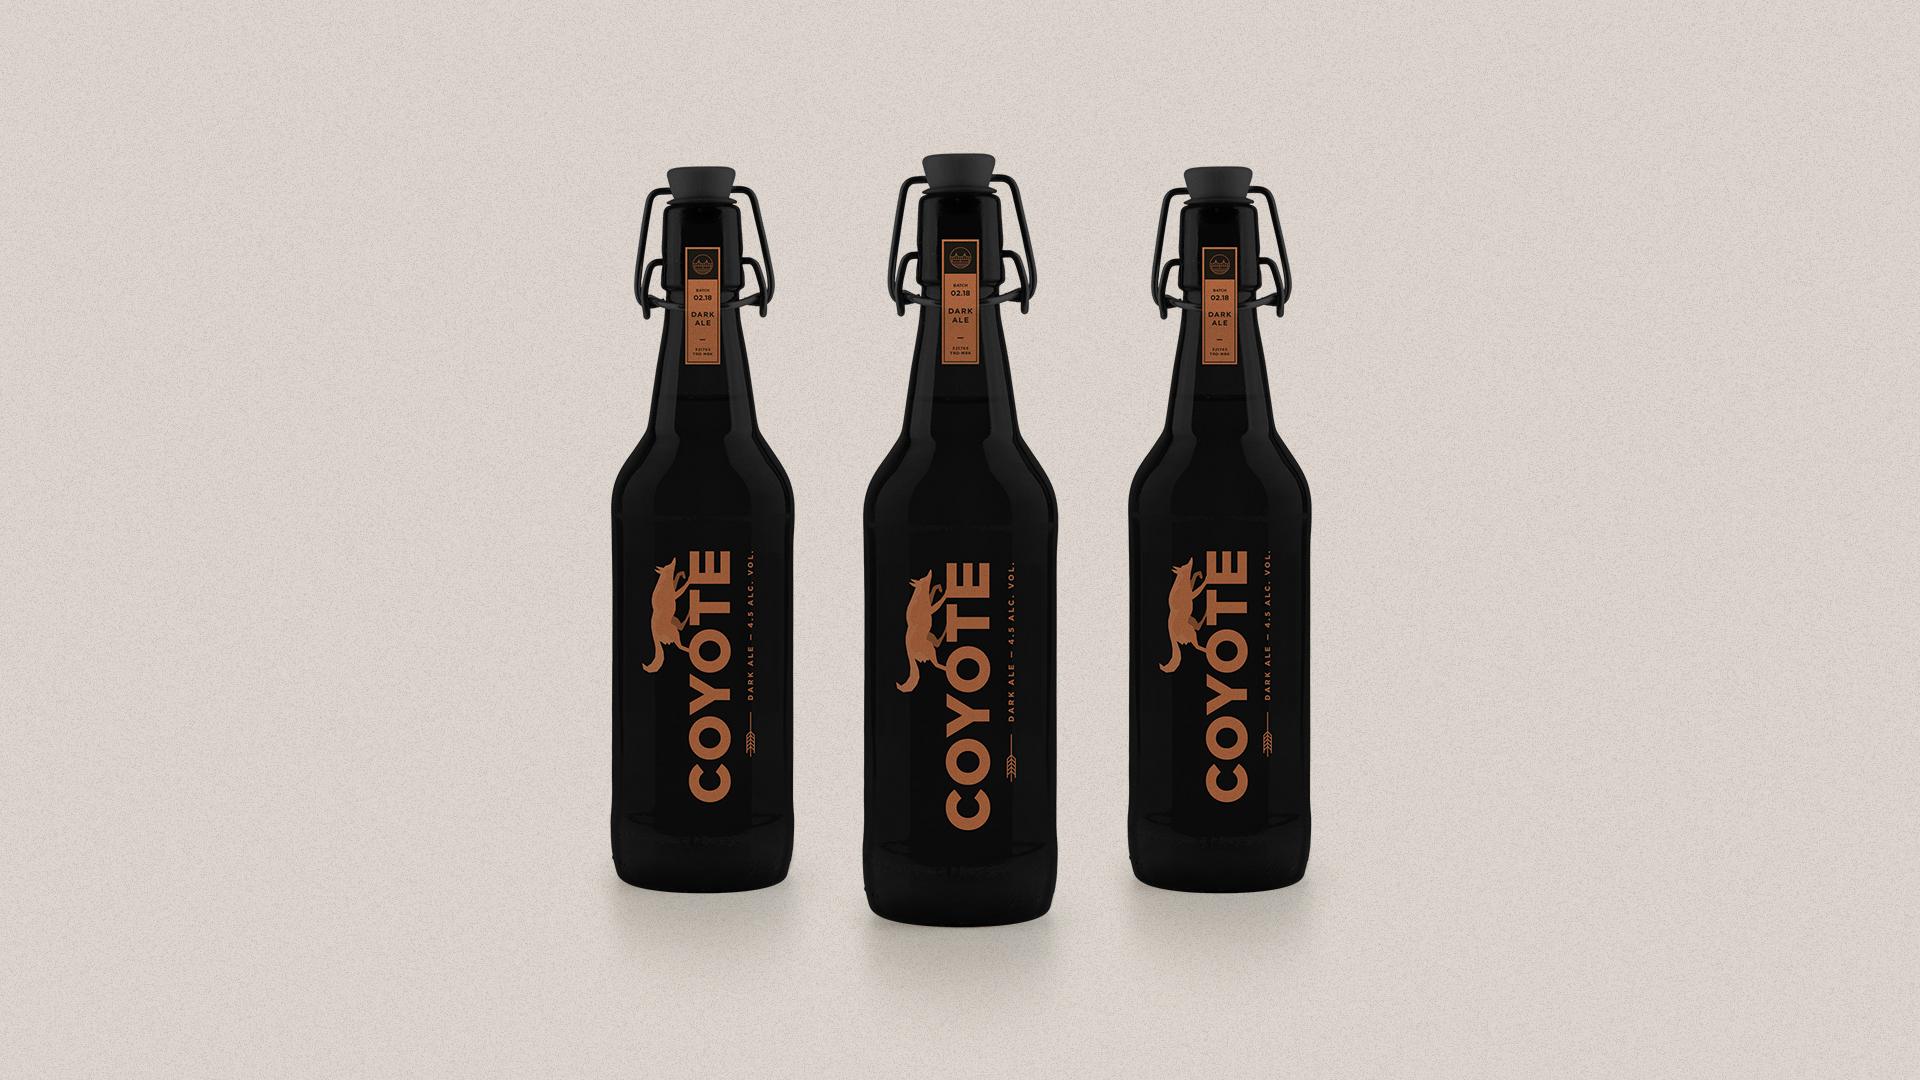 fmx_puenteviejo_botellas